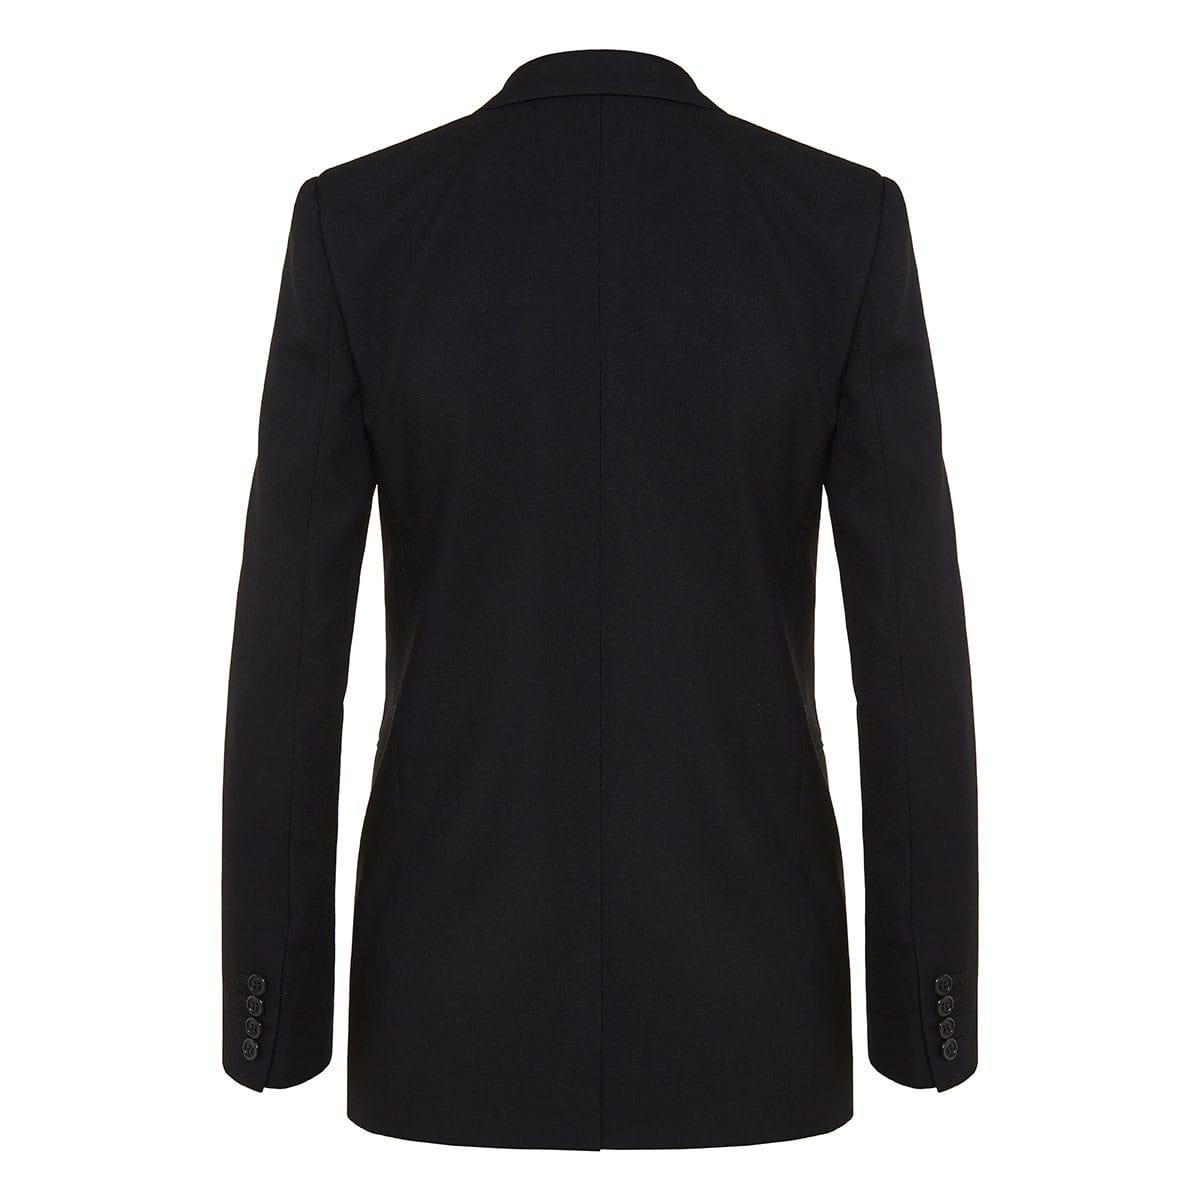 Single-breasted blazer